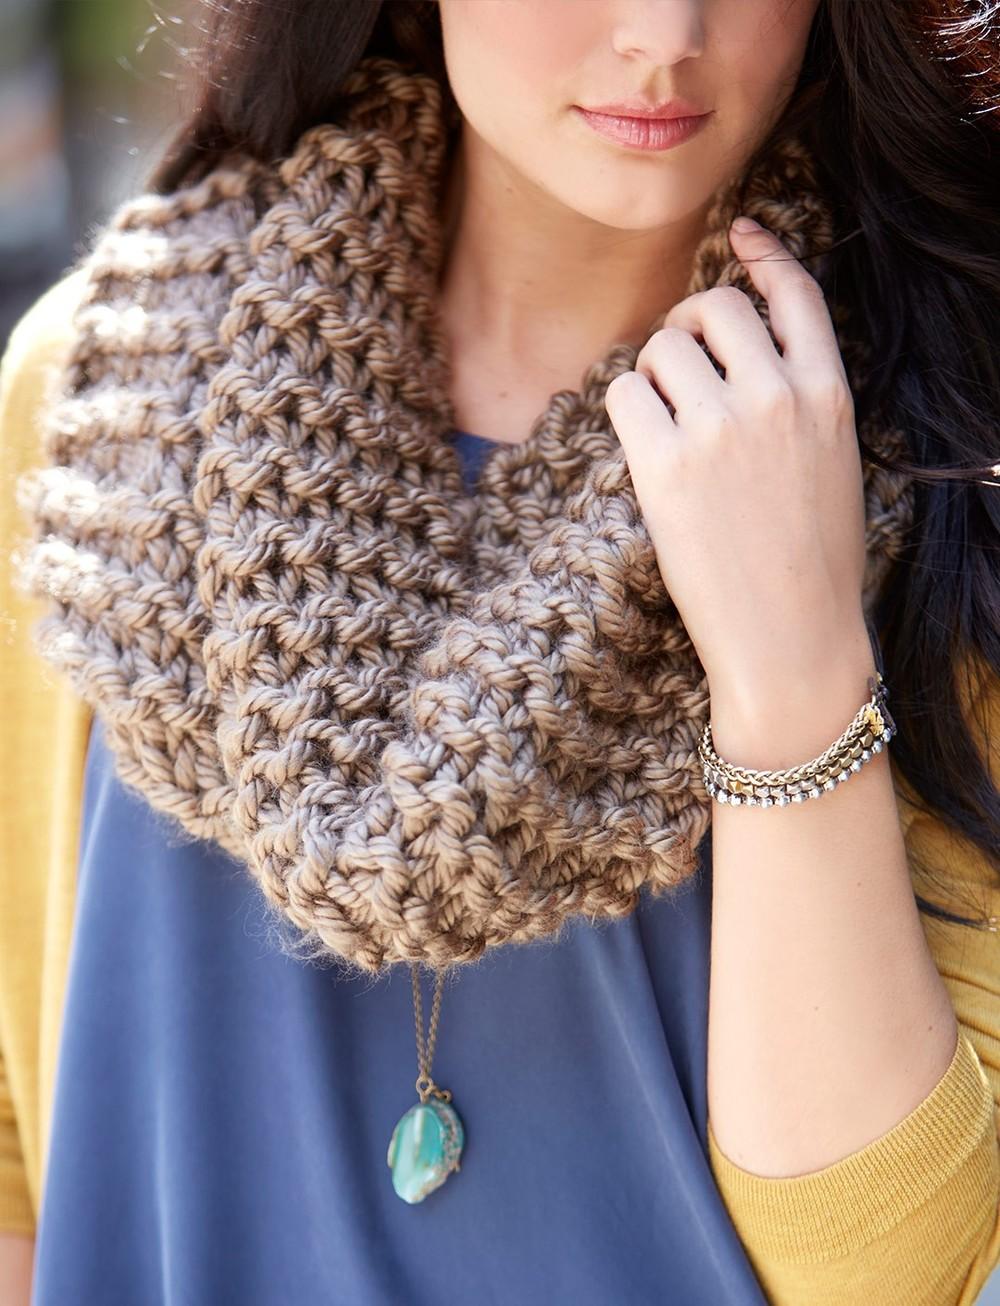 Knit Scarf Pattern Size 5 Needles : Simply Garter Cowl AllFreeKnitting.com